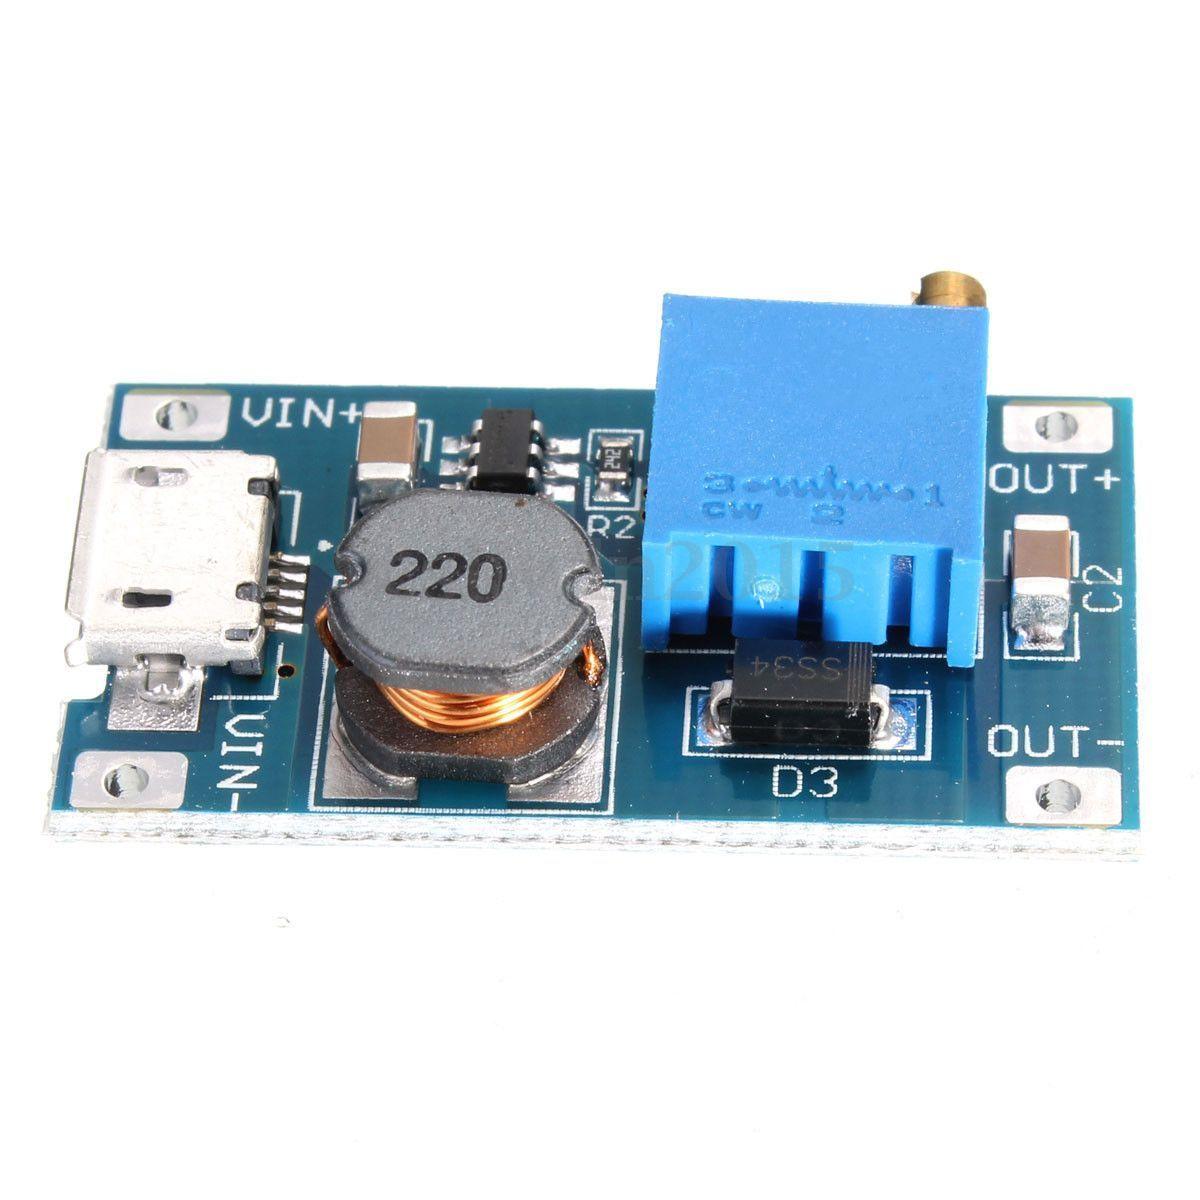 MT3608 2V-28V Micro-USB Step Up Boost Power Supply Voltage Converter Module